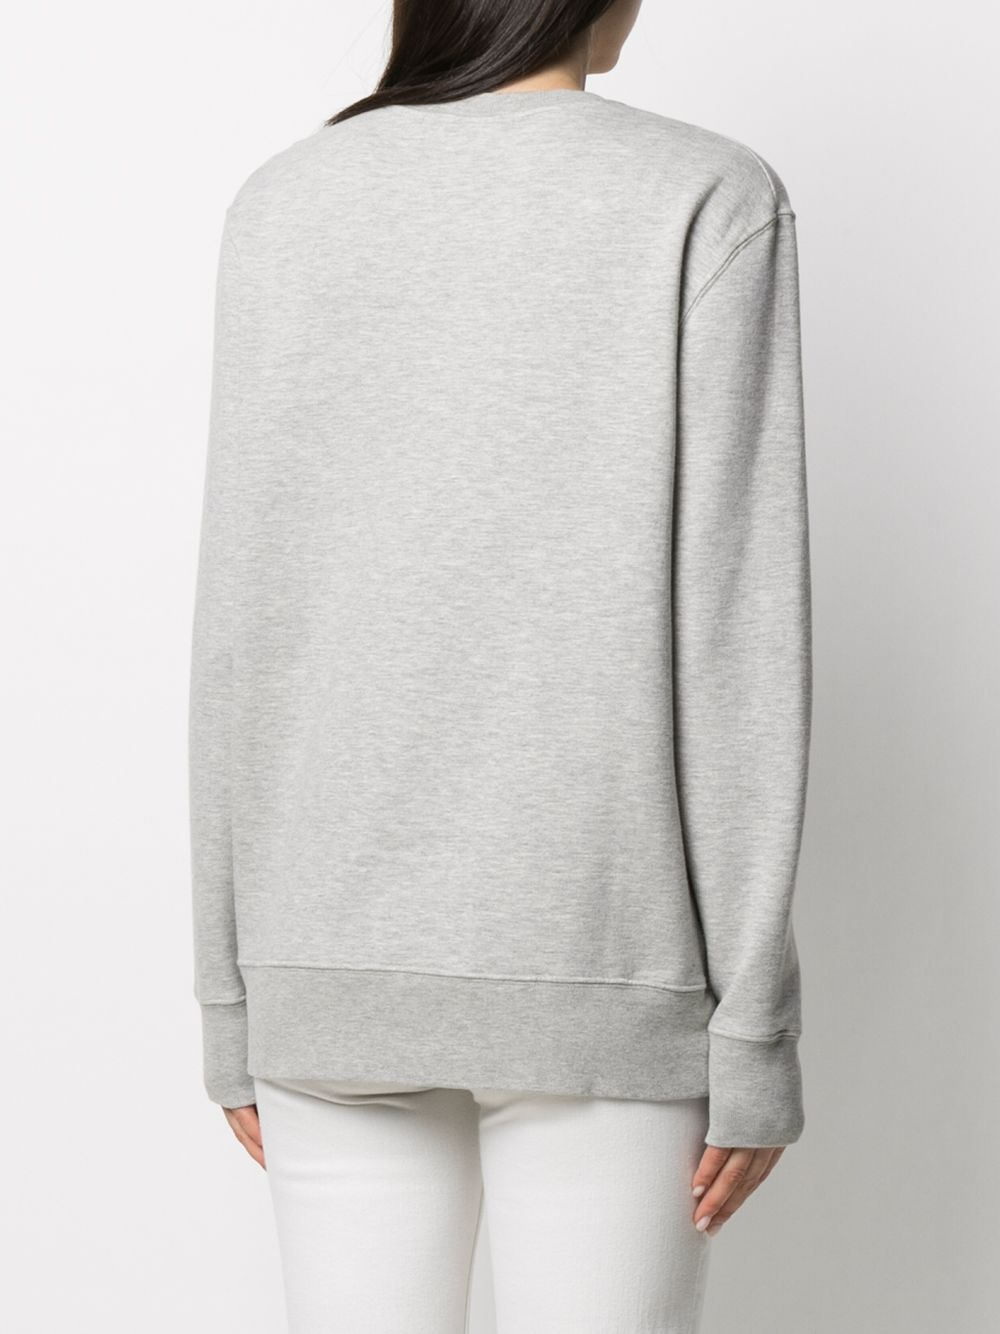 Logo appliqué sweatshirt AUTRY | Sweatshirts | SWXWA15W